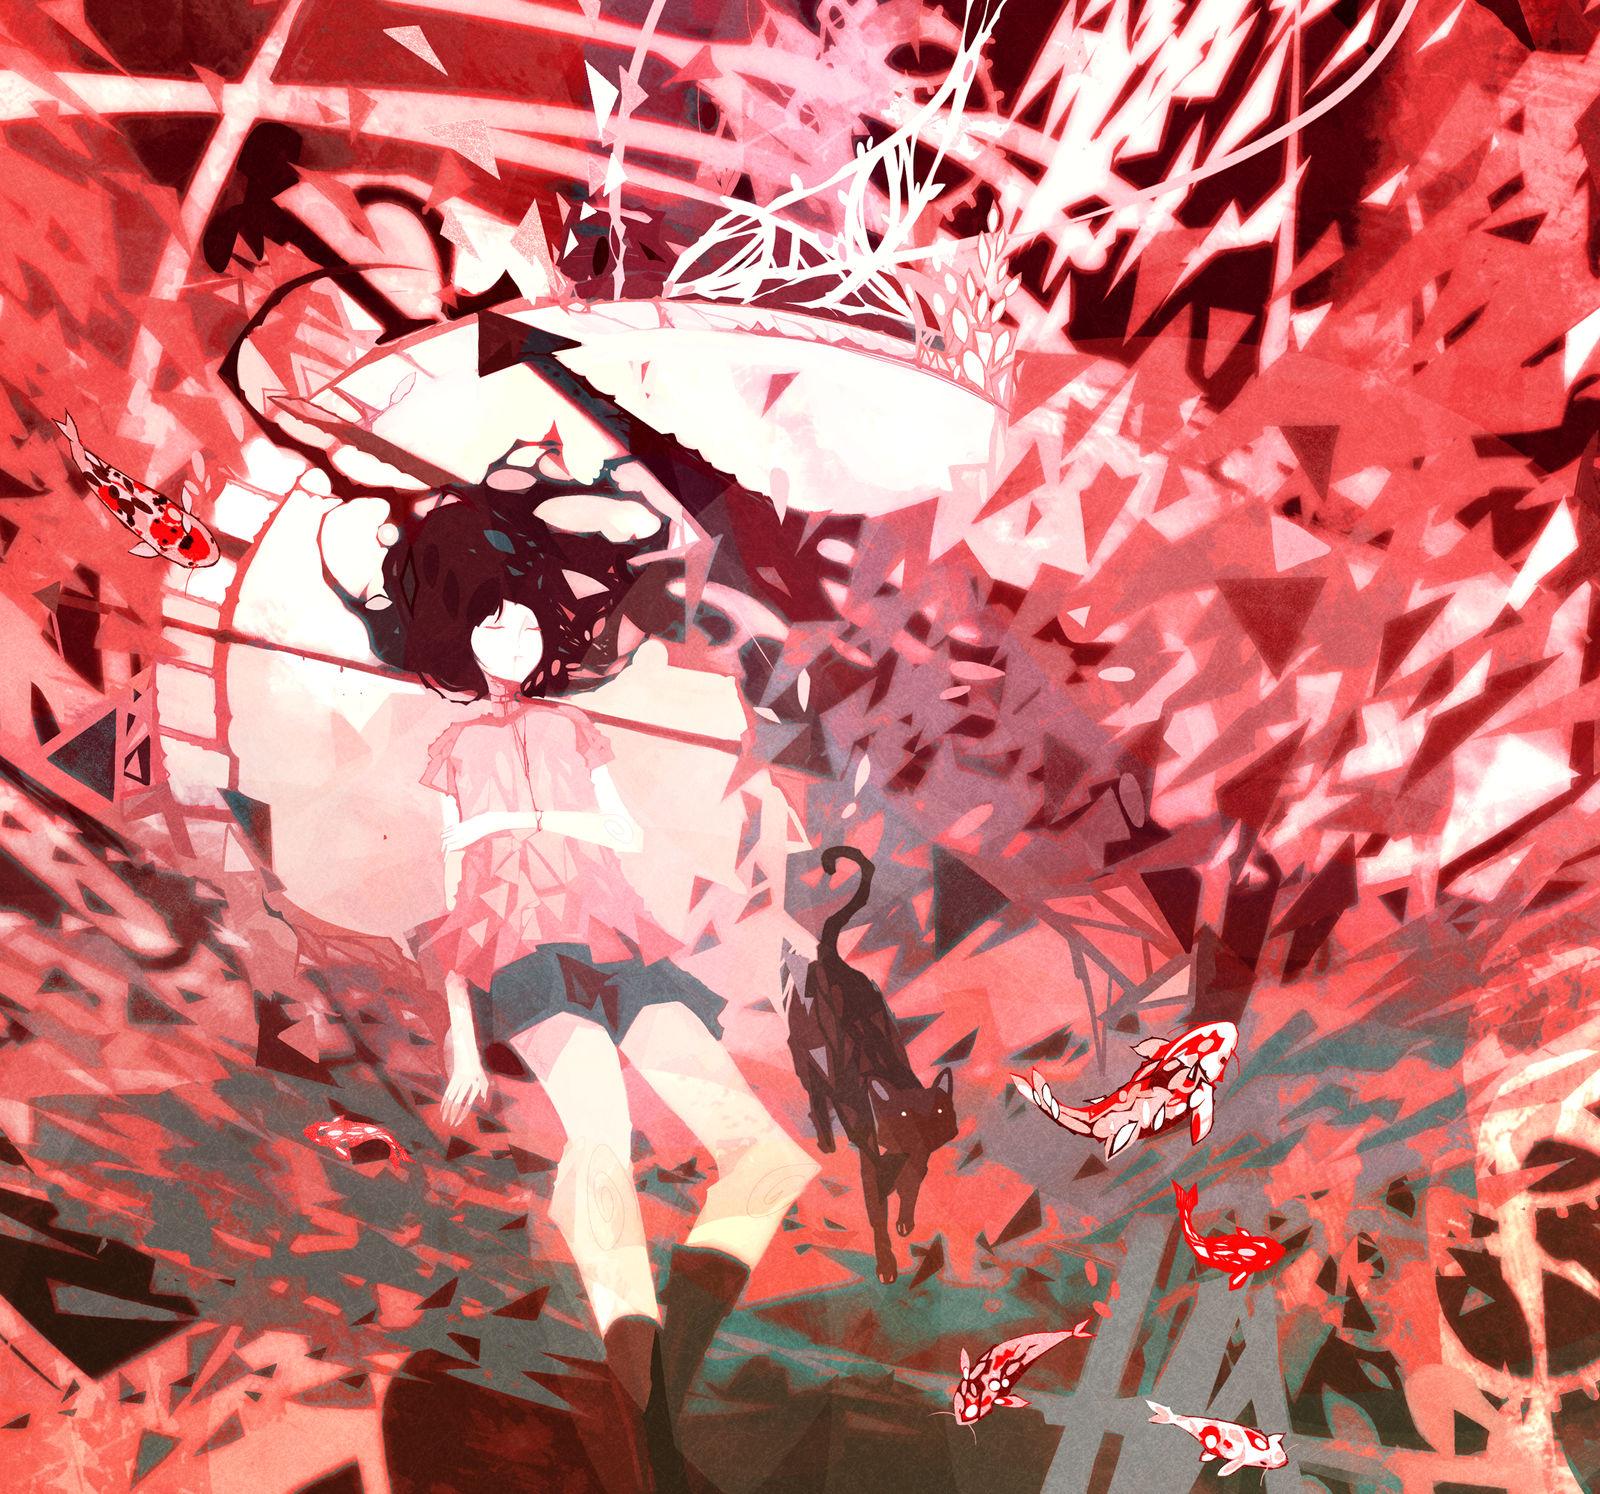 Death Within A Breath